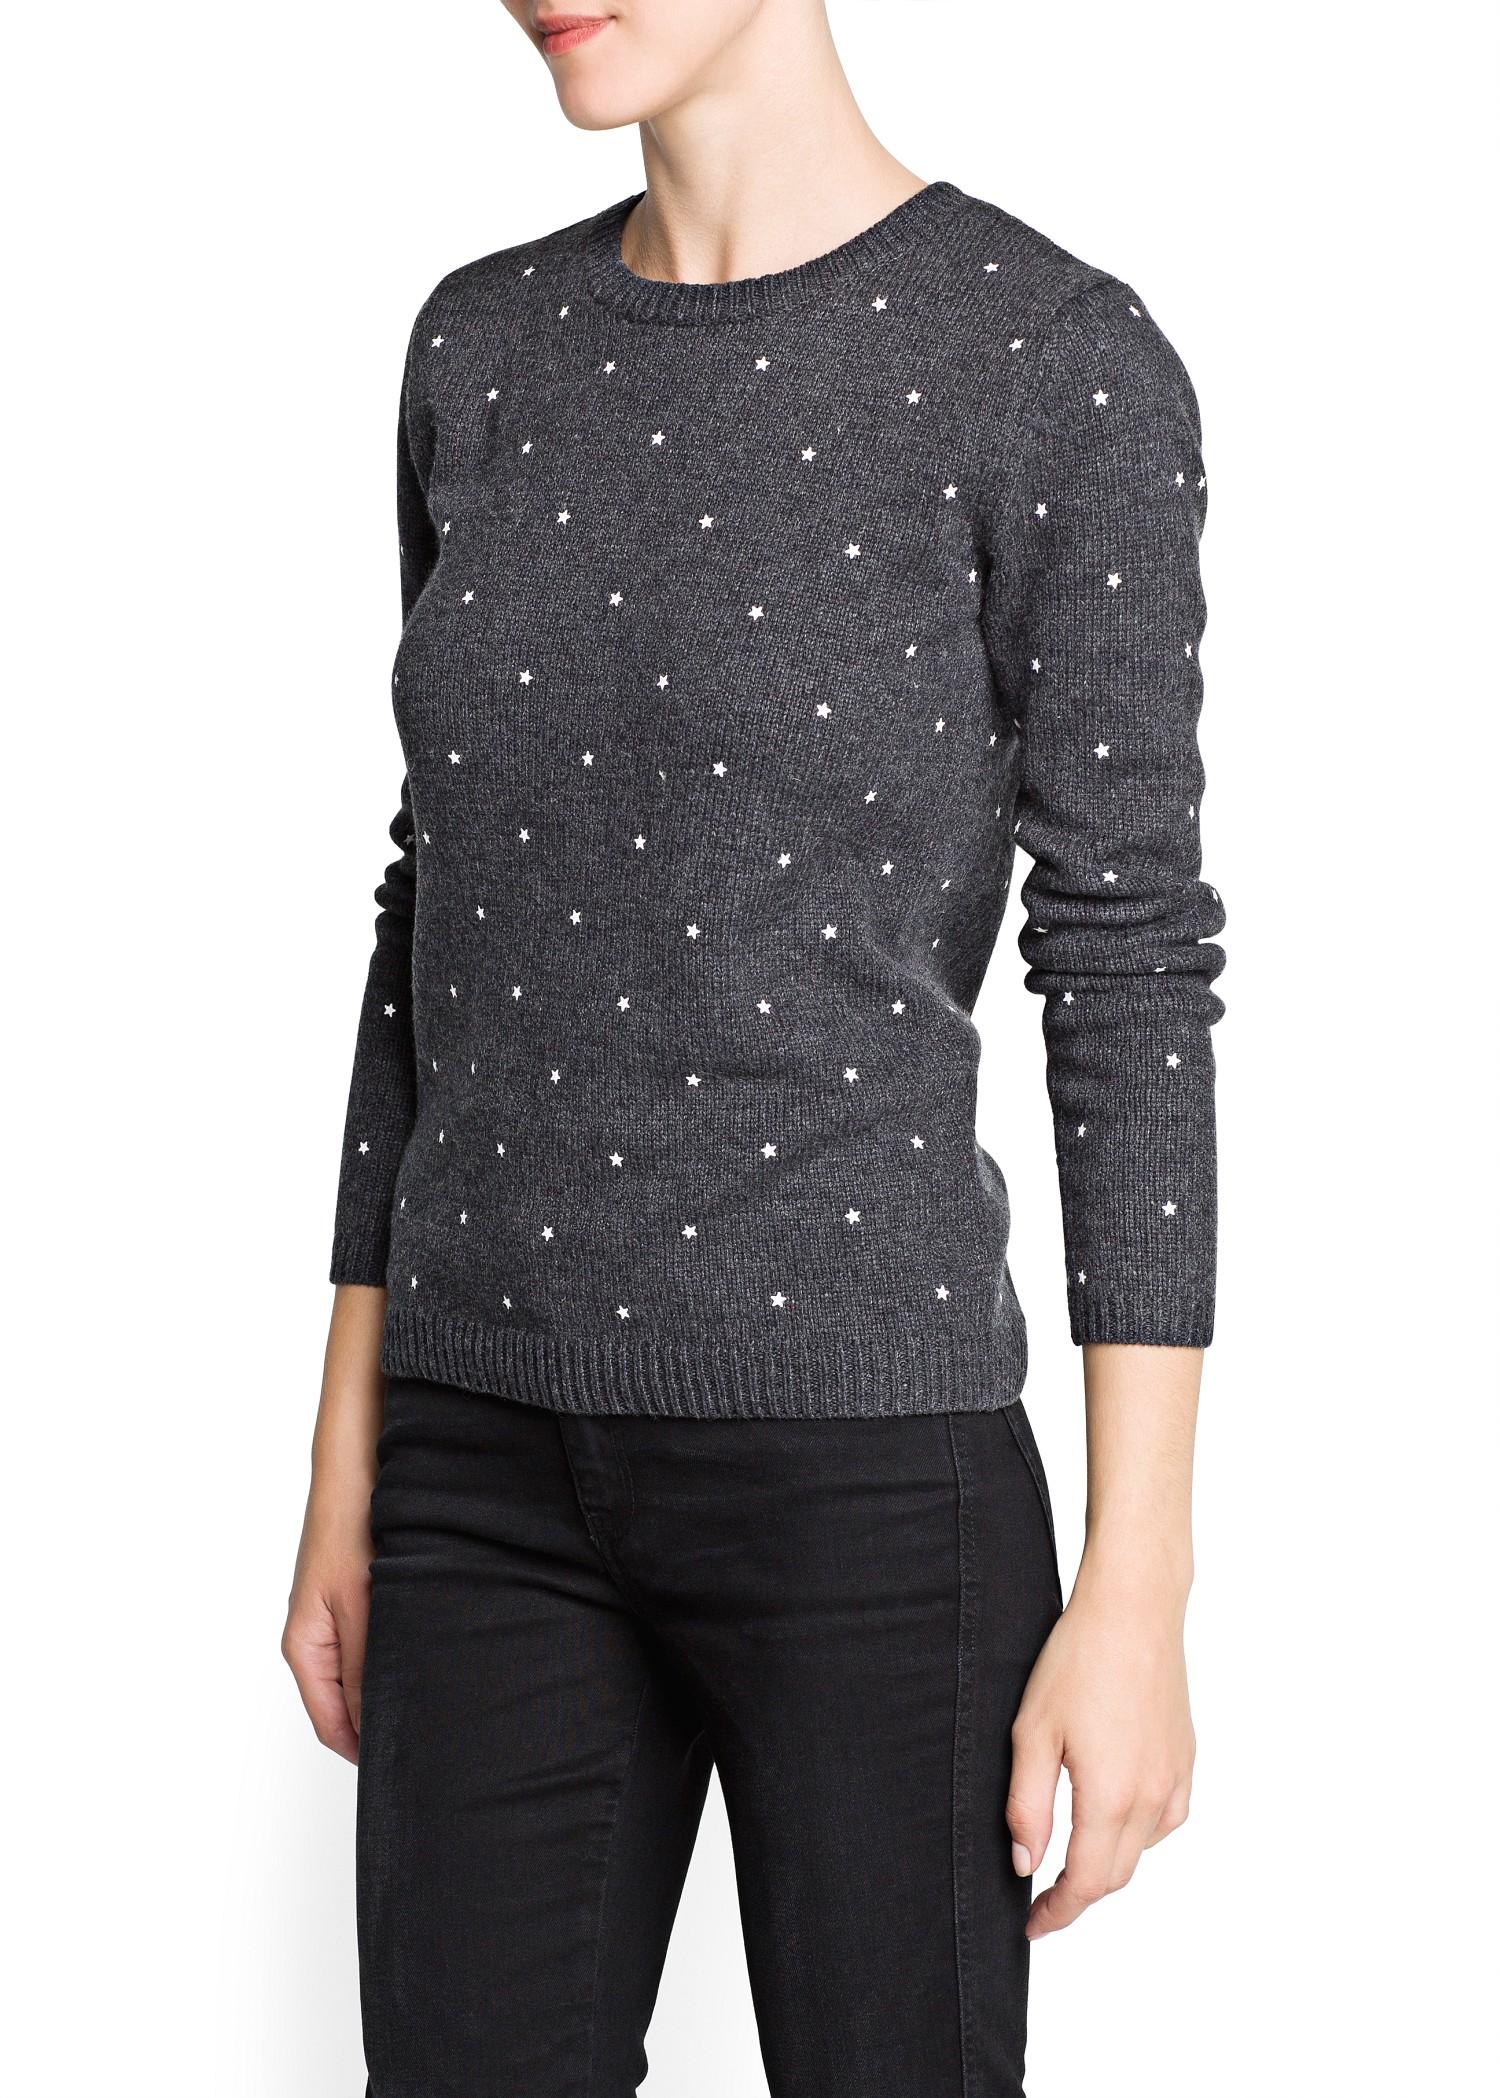 Lyst - Mango Star Appliqué Sweater in Gray